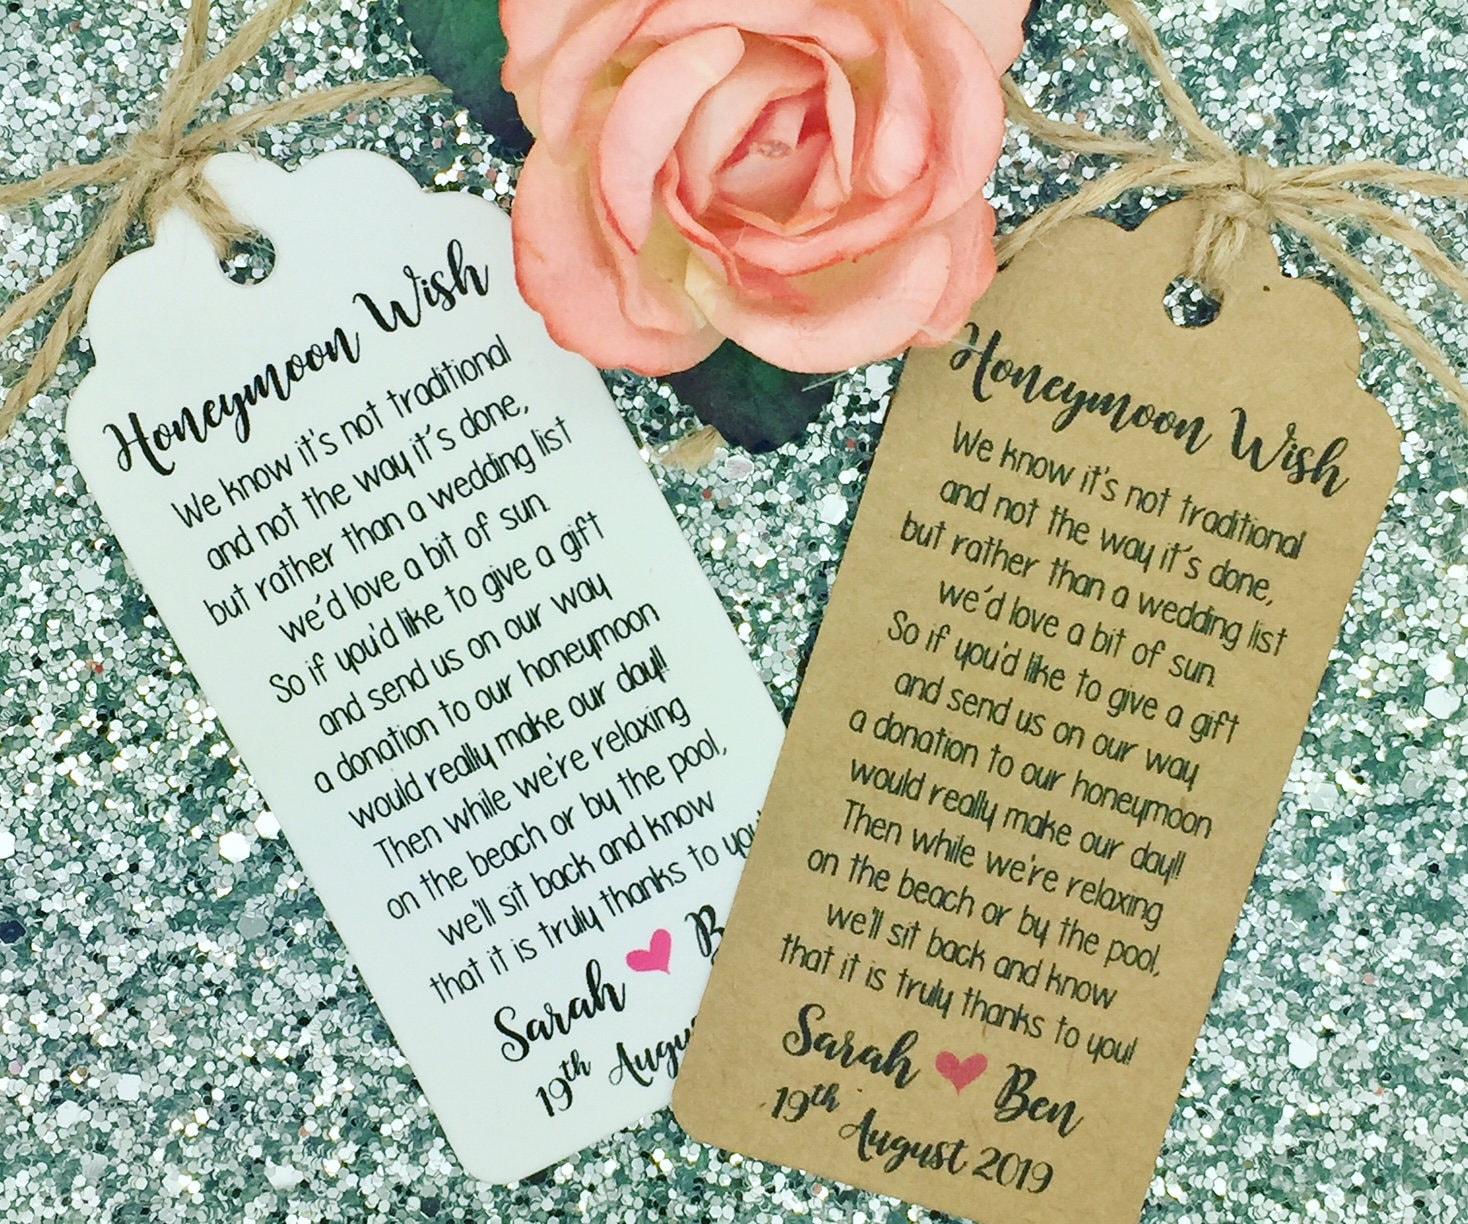 Thank You Wedding Gift Money: Wedding Honeymoon Fund Money Request Poem Card Favour Gift